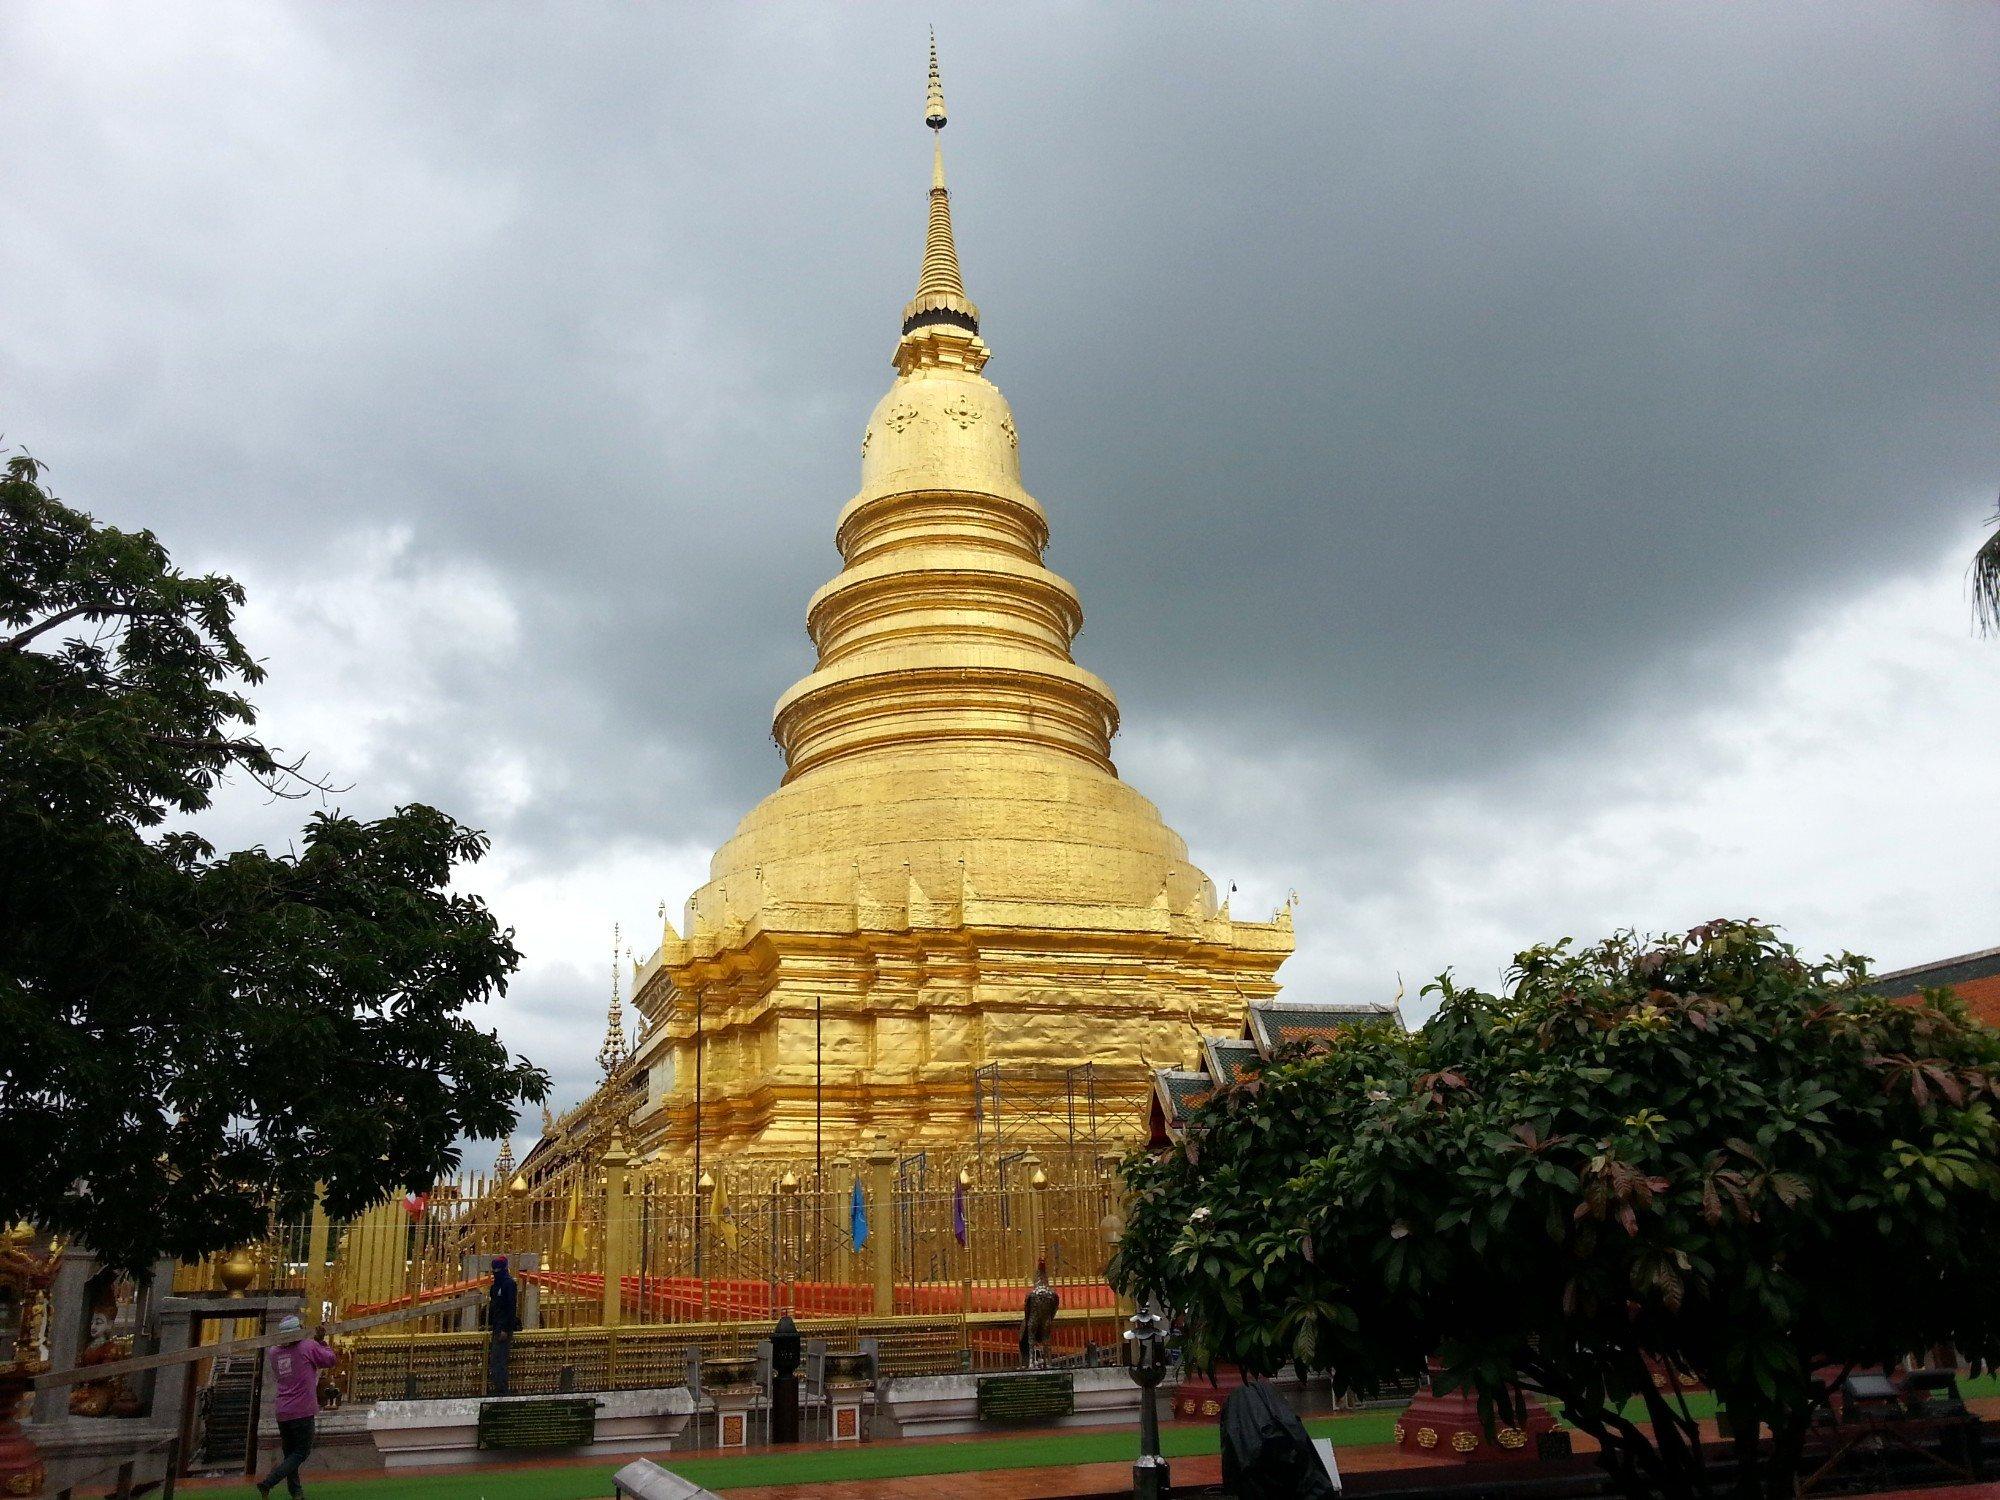 Wat Phra That Hariphunchai in Lamphun